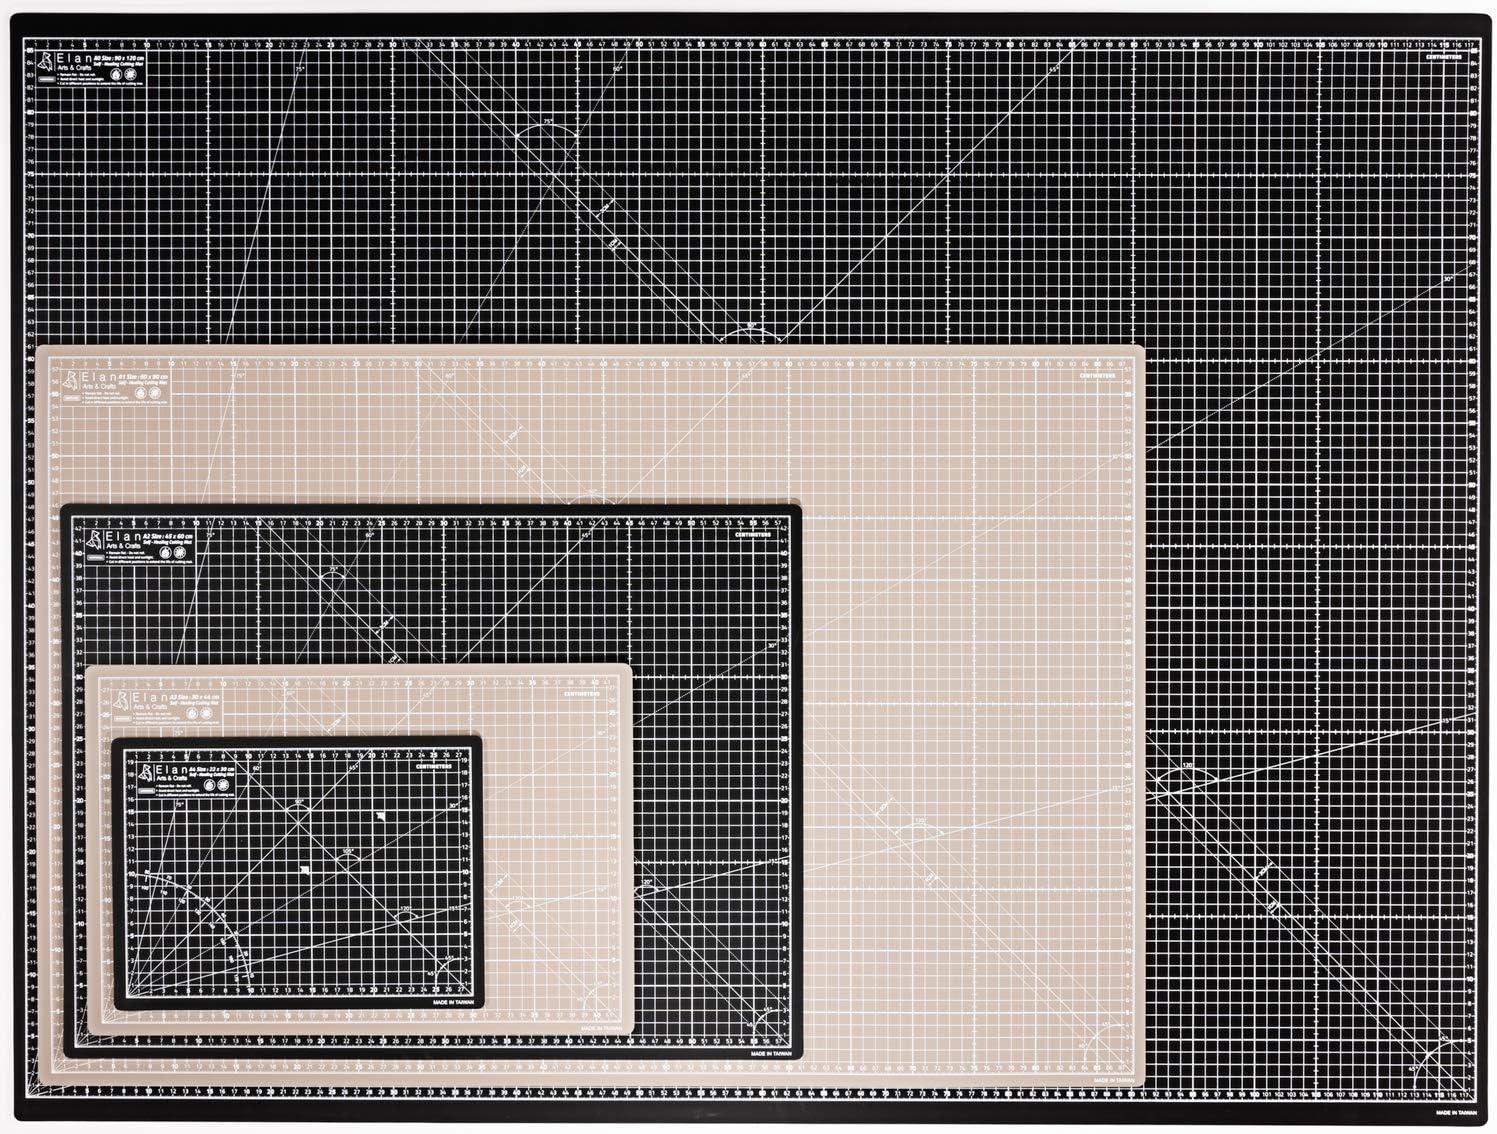 Dressmaking Accessories for Sewing Self-Healing Cutting Board Craft Self Healing Cutting Mat Quilting Elan Cutting Mat A0 A1 A2 A3 A4 Black and Brown Art Mat A4 5-Ply Craft Mat and Crafting 120cm 90cm 60cm 44cm 30cm